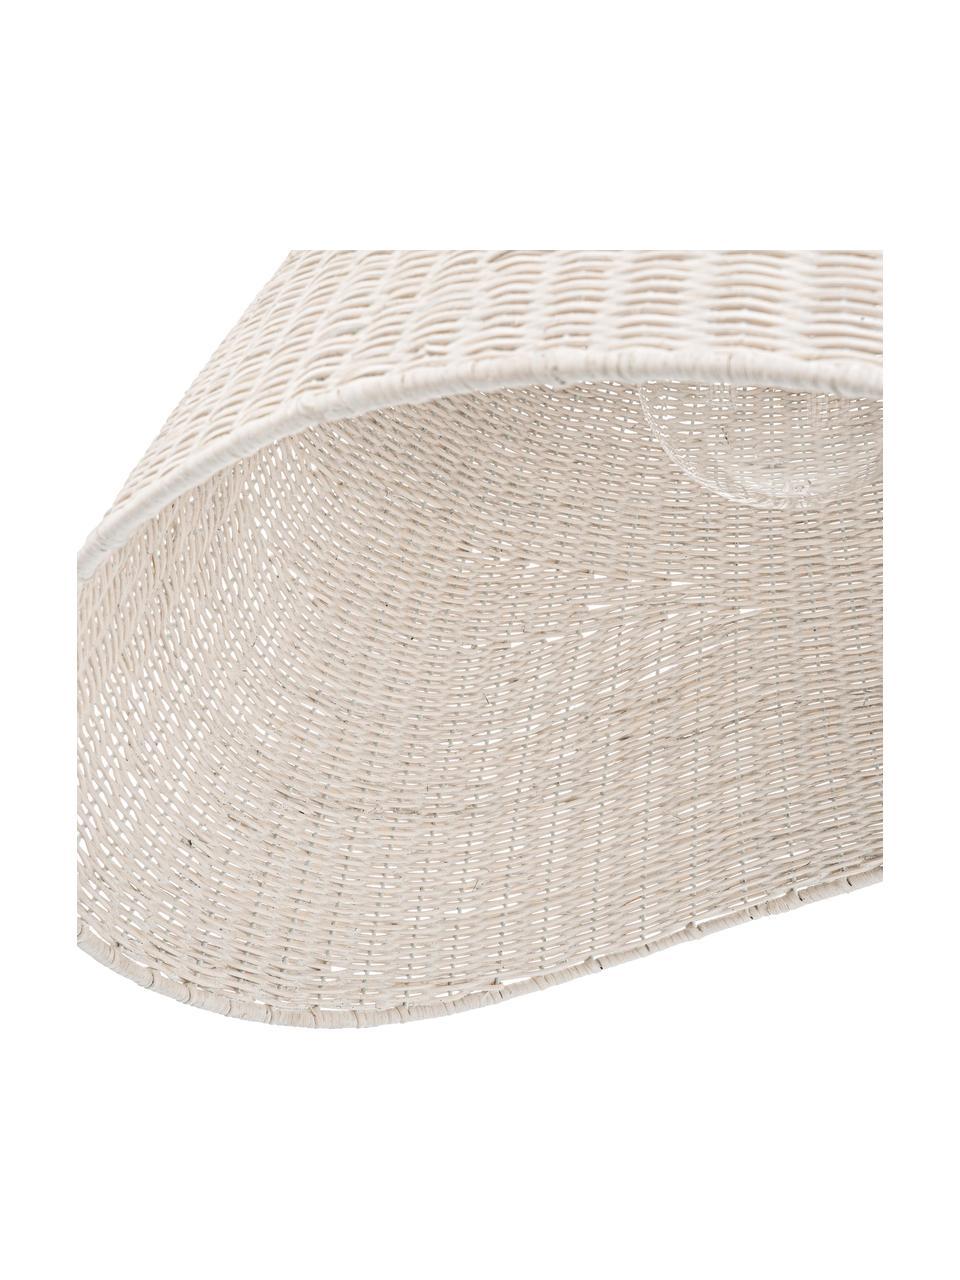 Grande suspension scandinave en bambou Arvid, Blanc